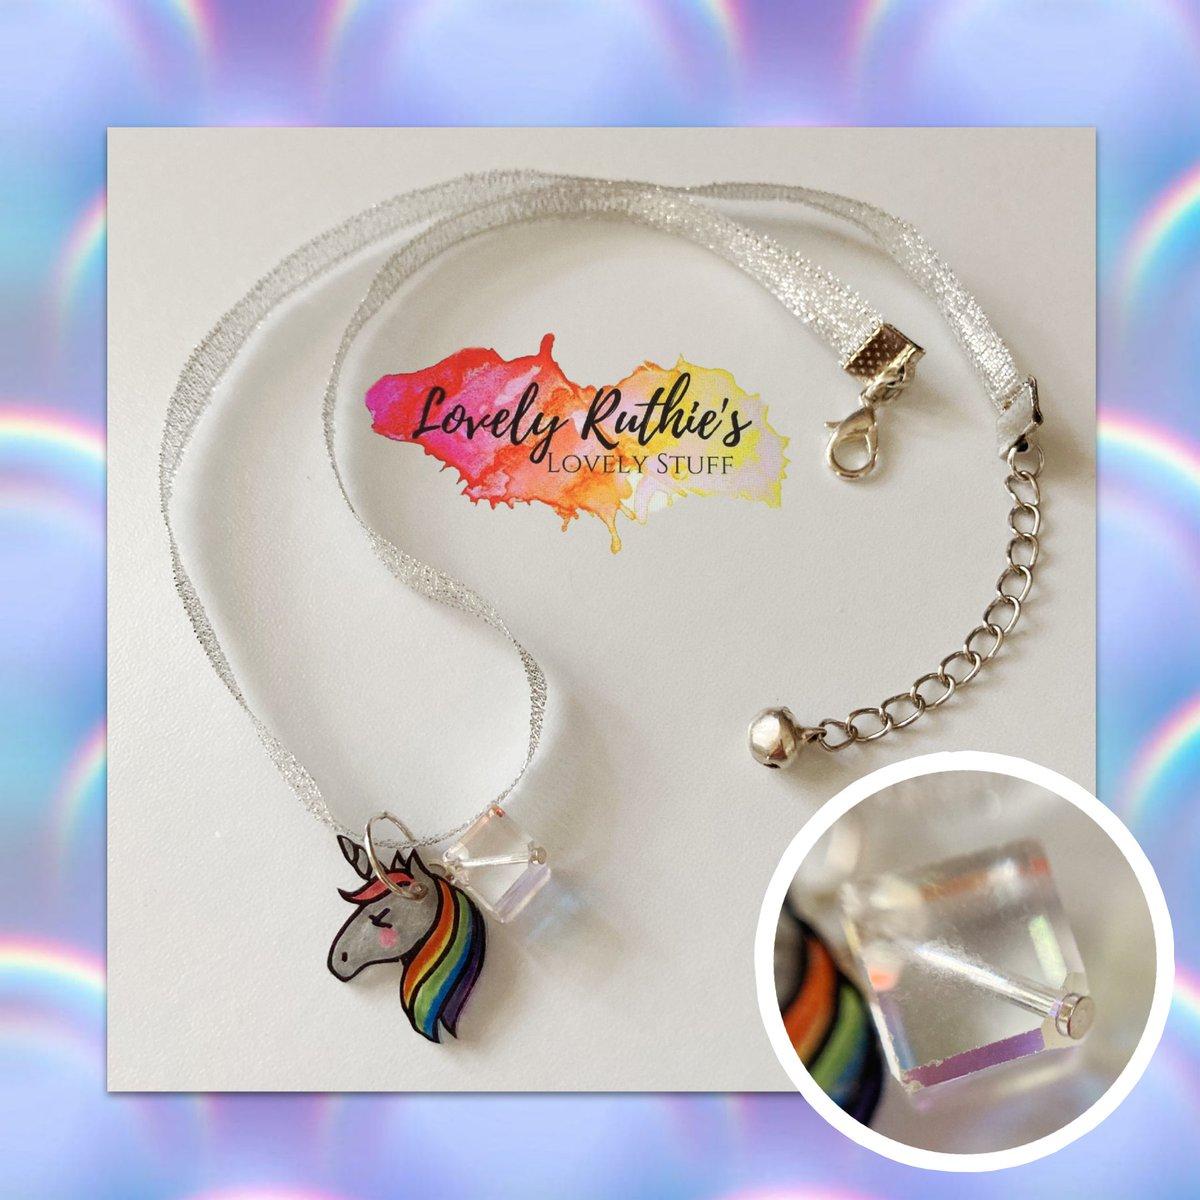 A magical #MidweekMakes! #Rainbow #Crystal #Unicorn #Glitter #necklace http://etsy.me/3ecgGhG via @Etsypic.twitter.com/Q6qovULG3q